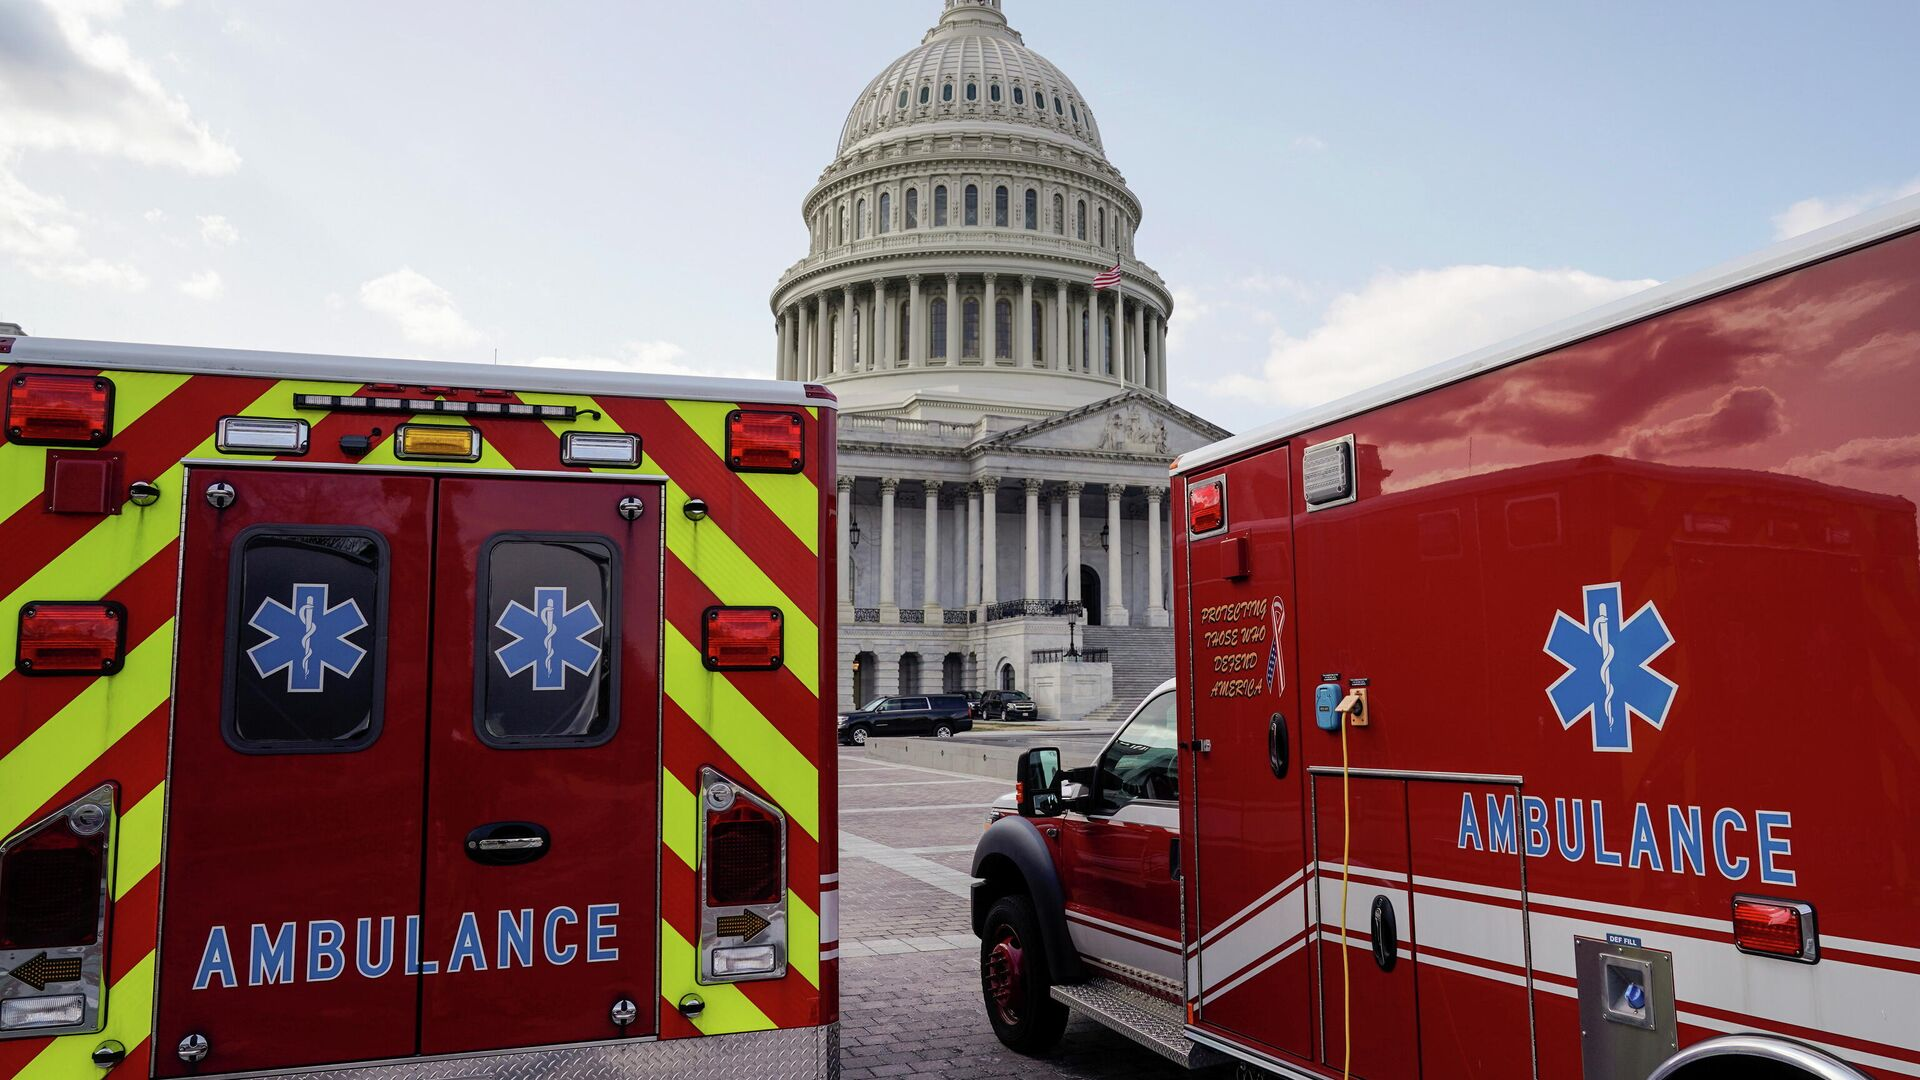 Ambulancias en Capitol Hill, Washington - Sputnik Mundo, 1920, 31.03.2021